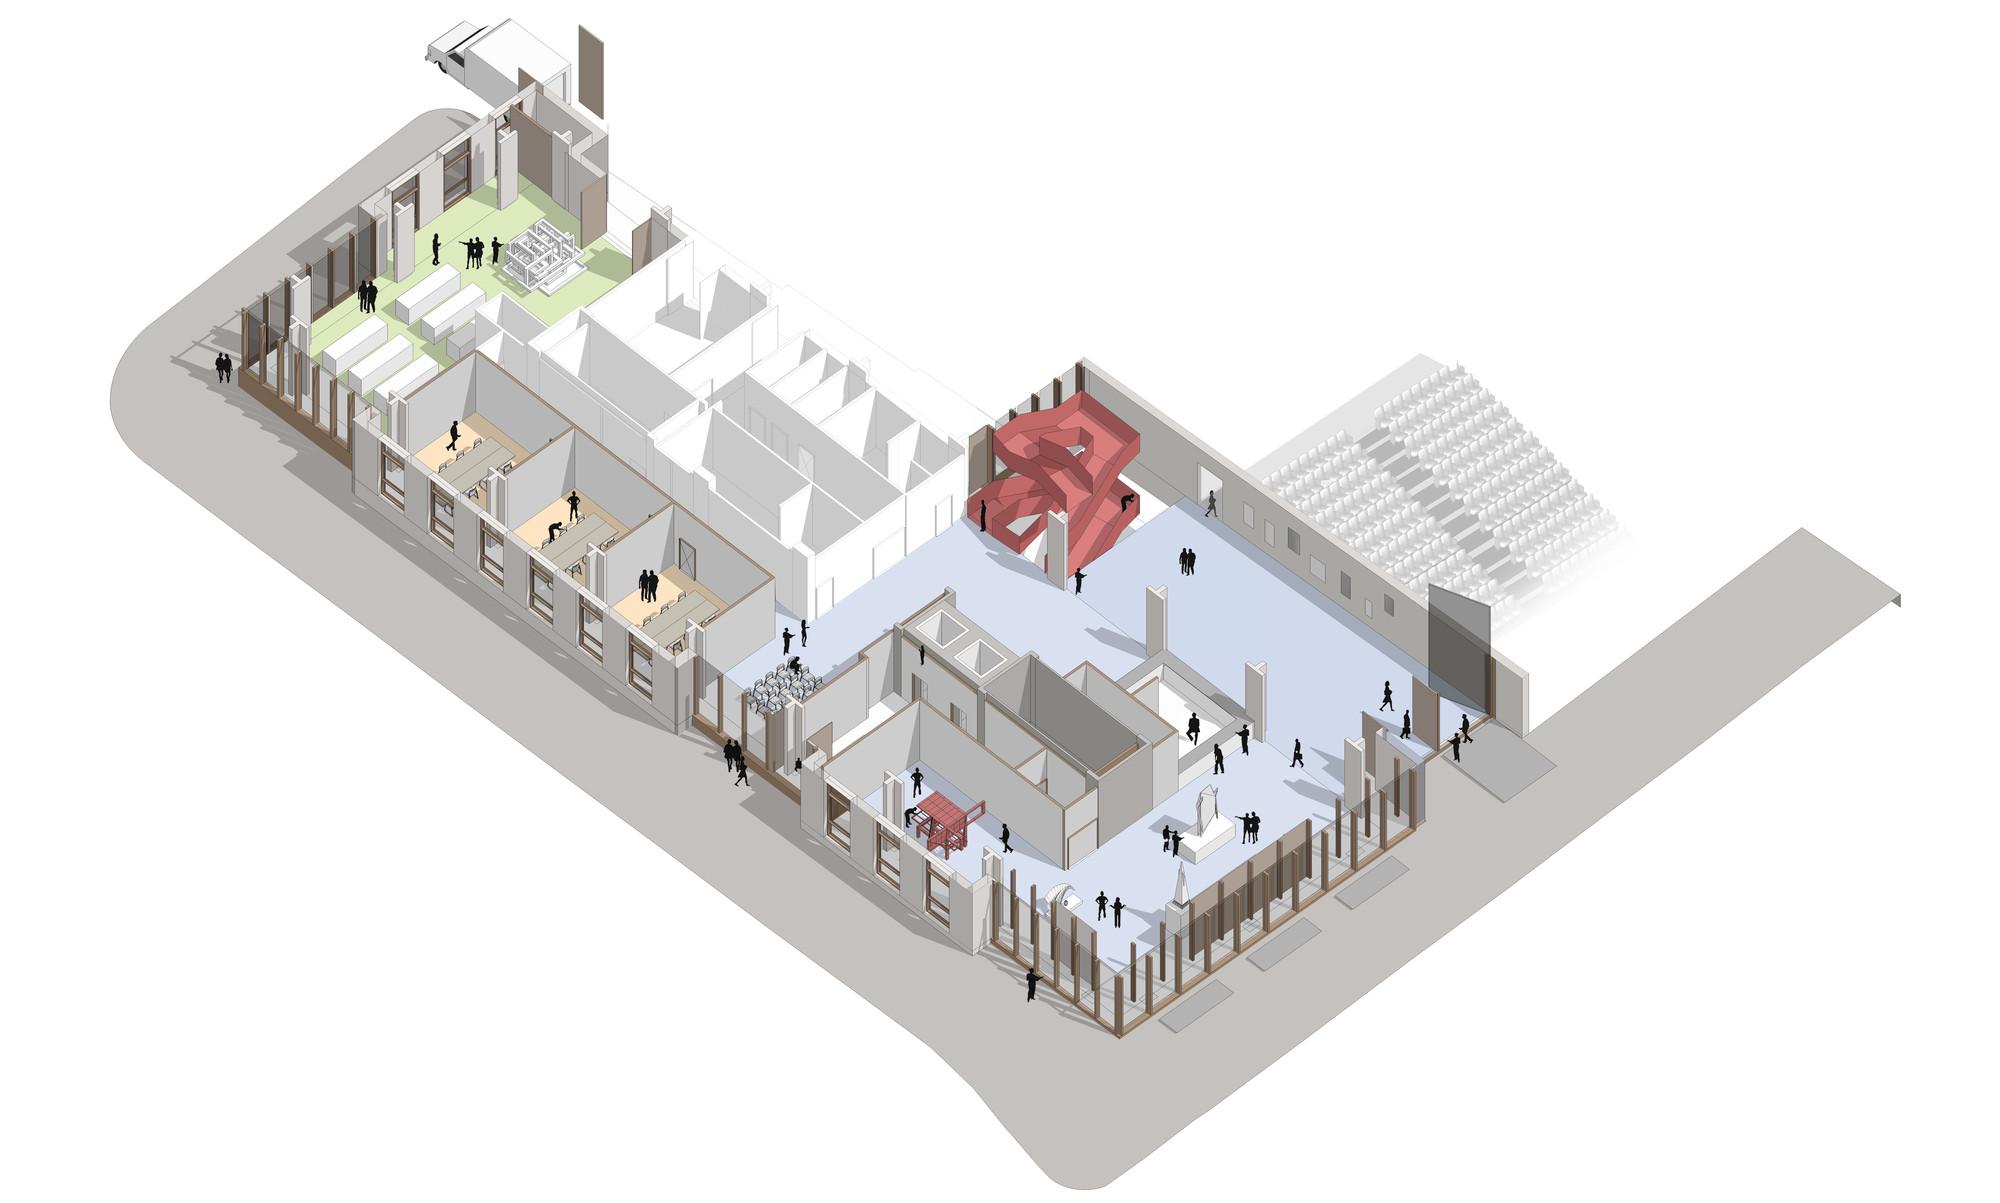 gallery of hawkinsbrown reveal plans for bartlett school revamp - 9